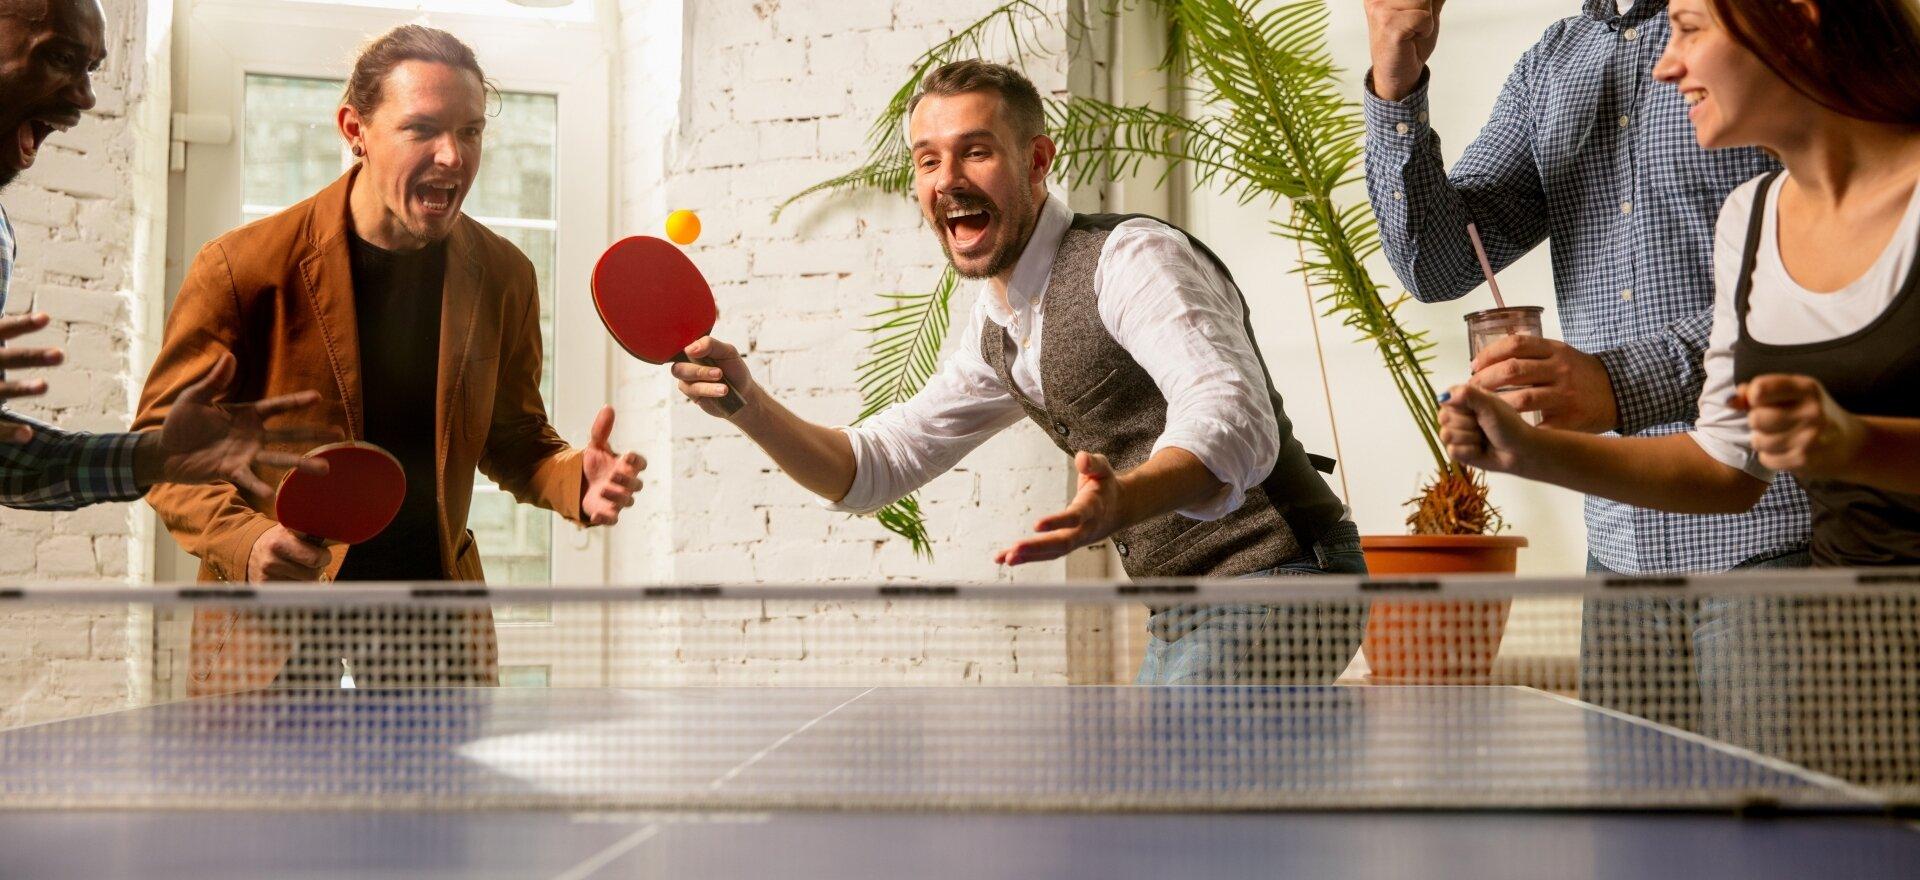 Ping-Pong Bajnokság Club teremben